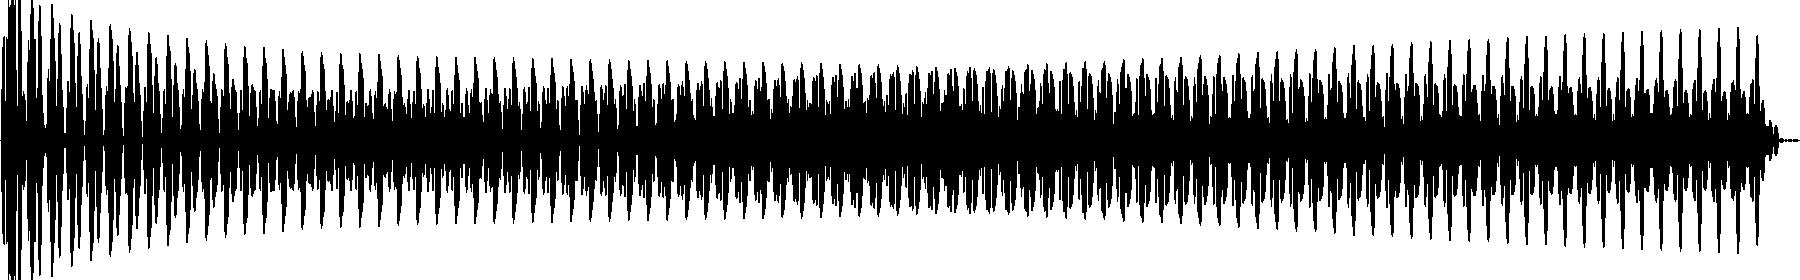 vedh bass cut 103 d